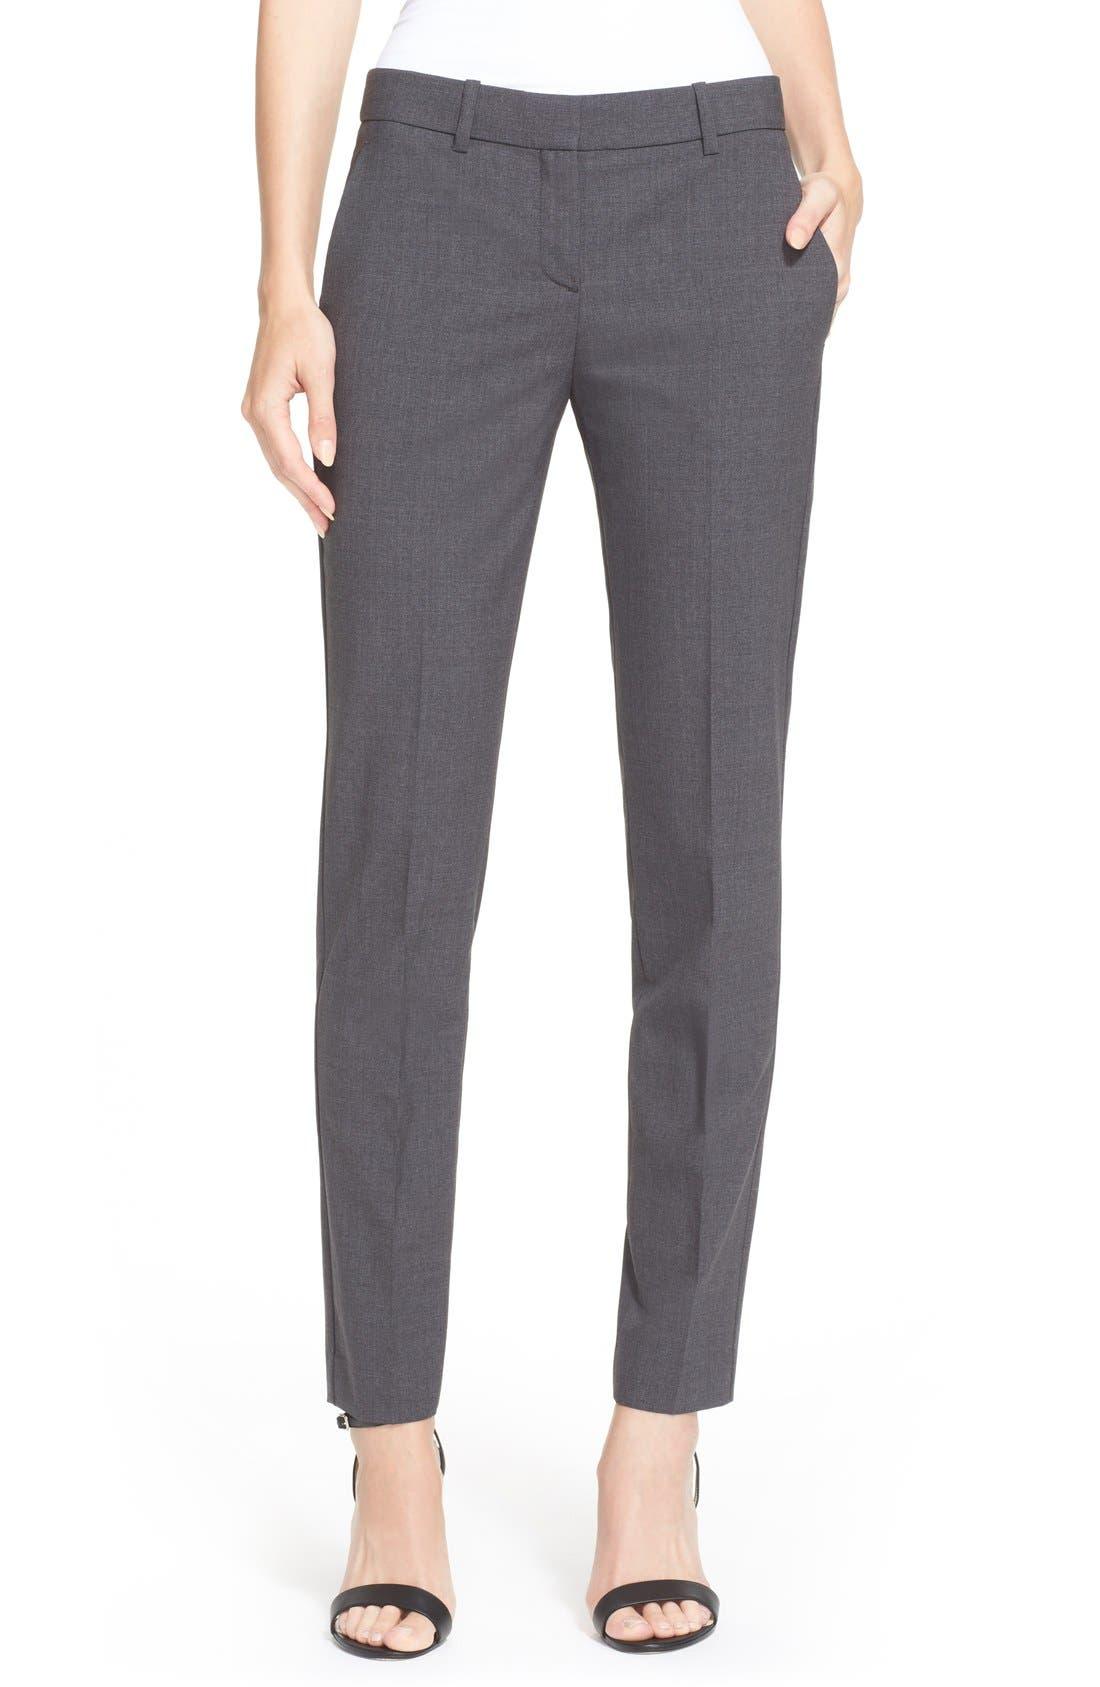 Testra 2B Stretch Wool Pants,                             Main thumbnail 1, color,                             020